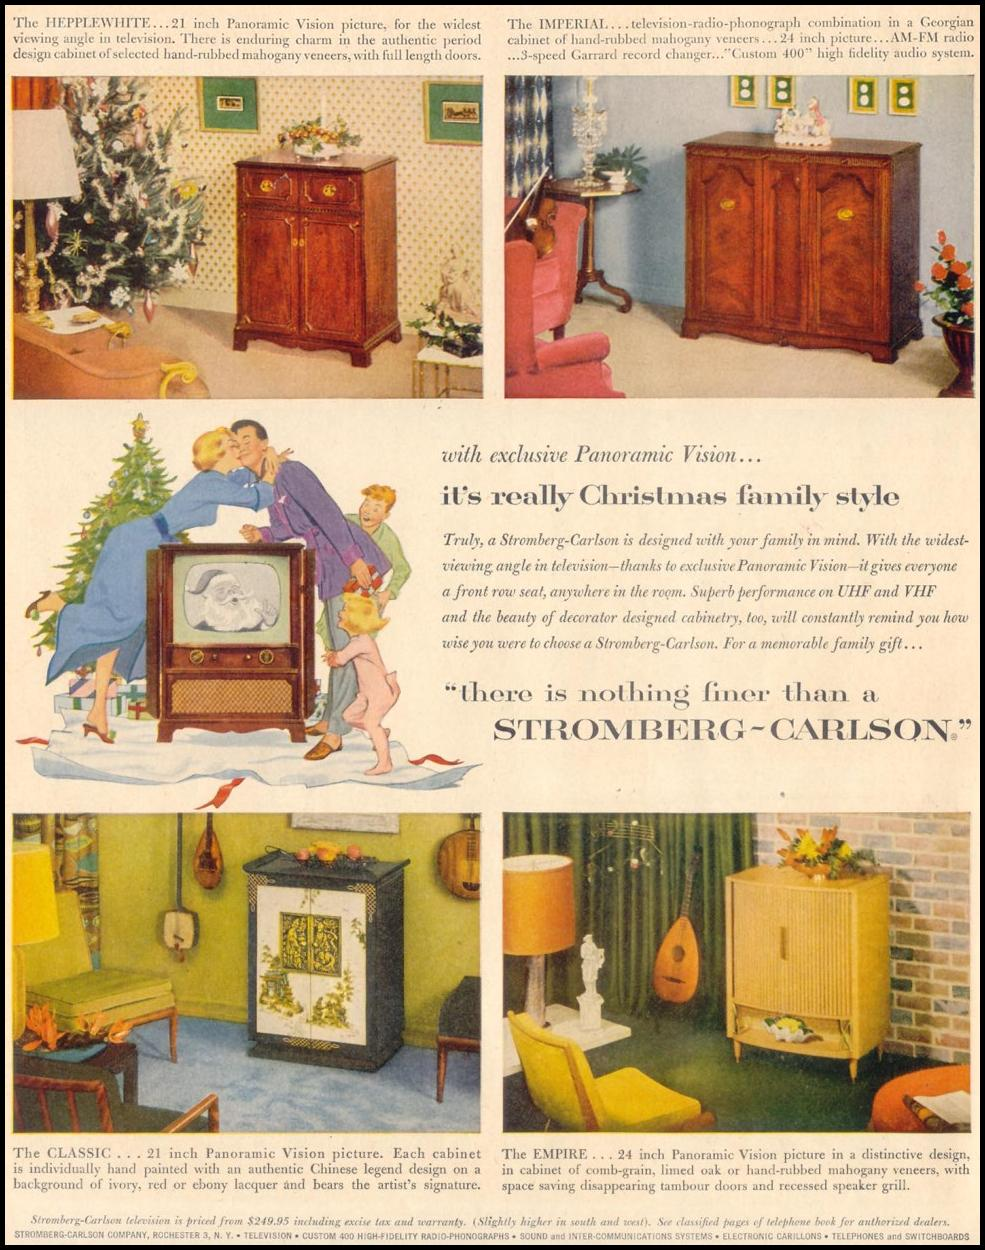 STROMBERG-CARLSON TELEVISIONS LIFE 11/30/1953 p. 128